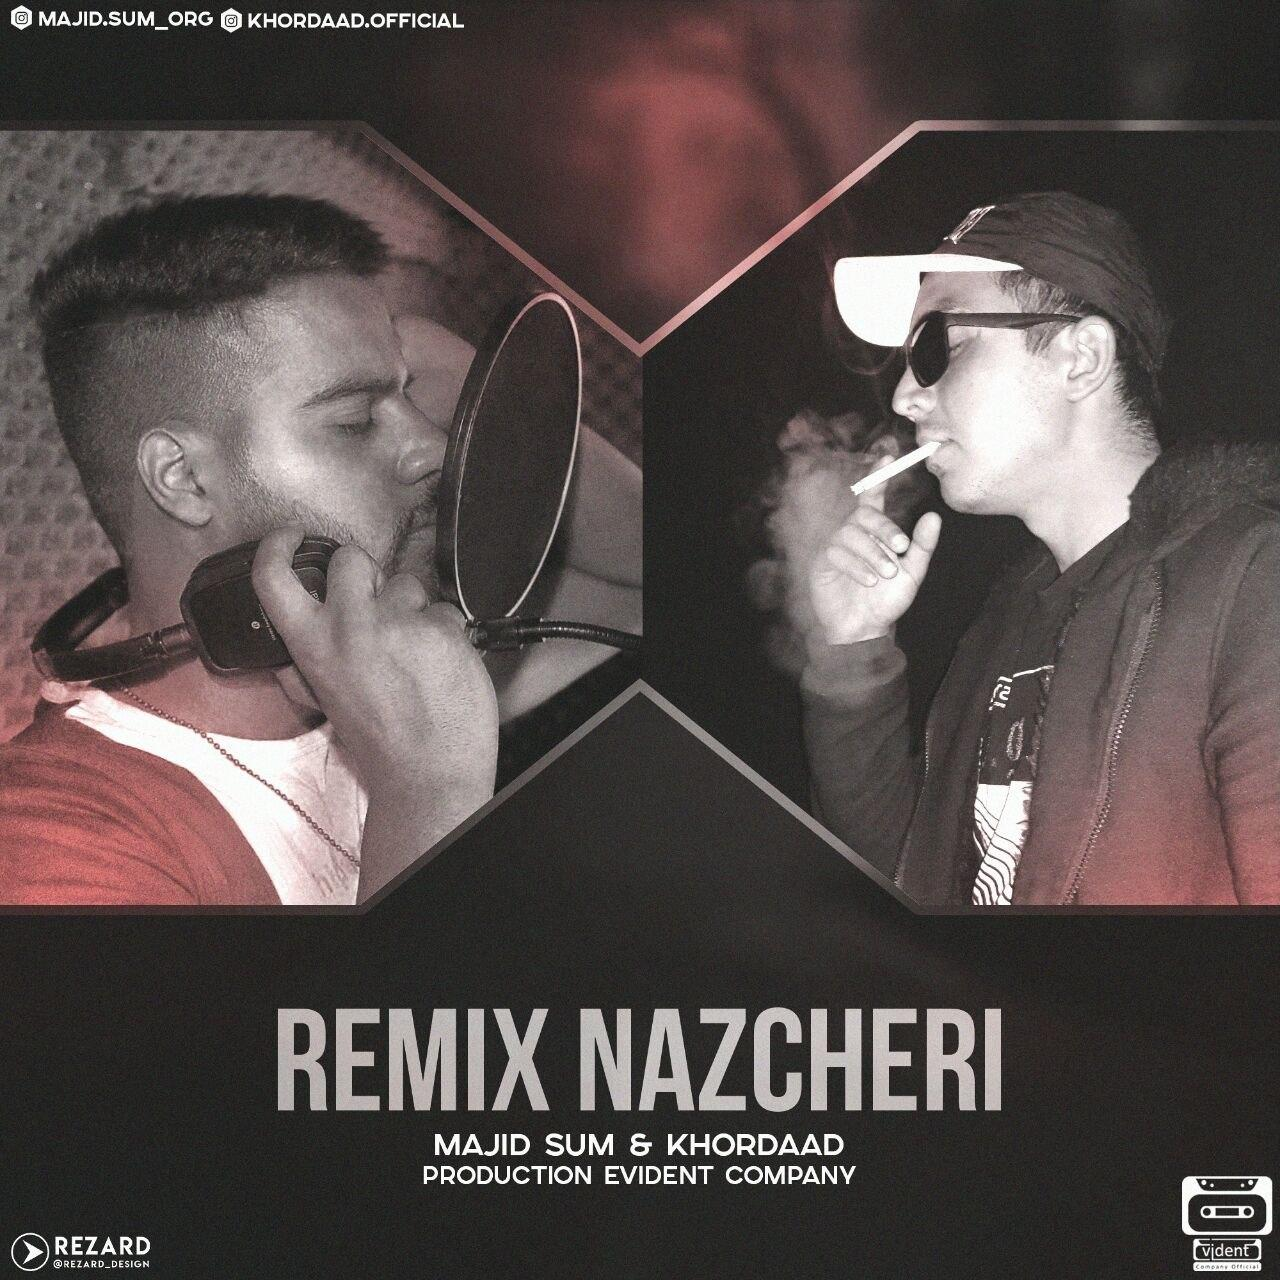 Majid Sum – Remix Nazcheri